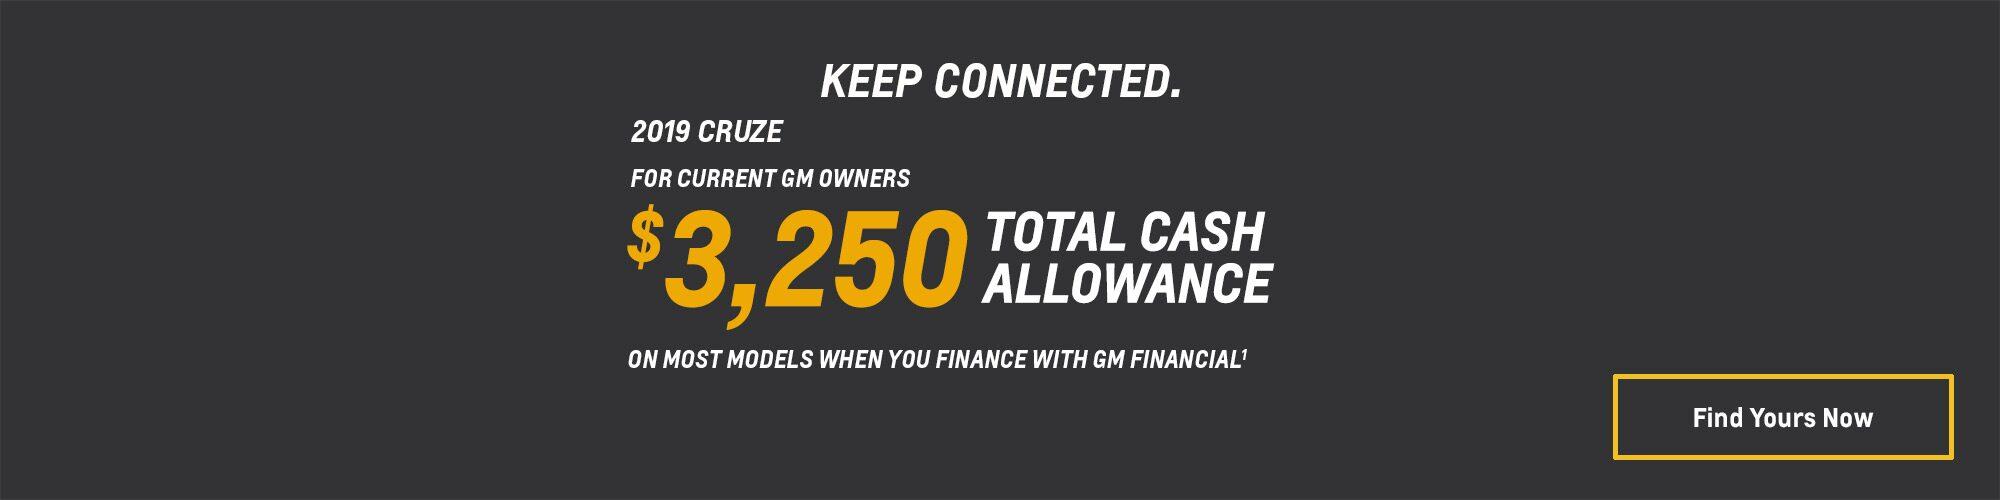 2019 Cruze: $3,250 Total Cash Allowance